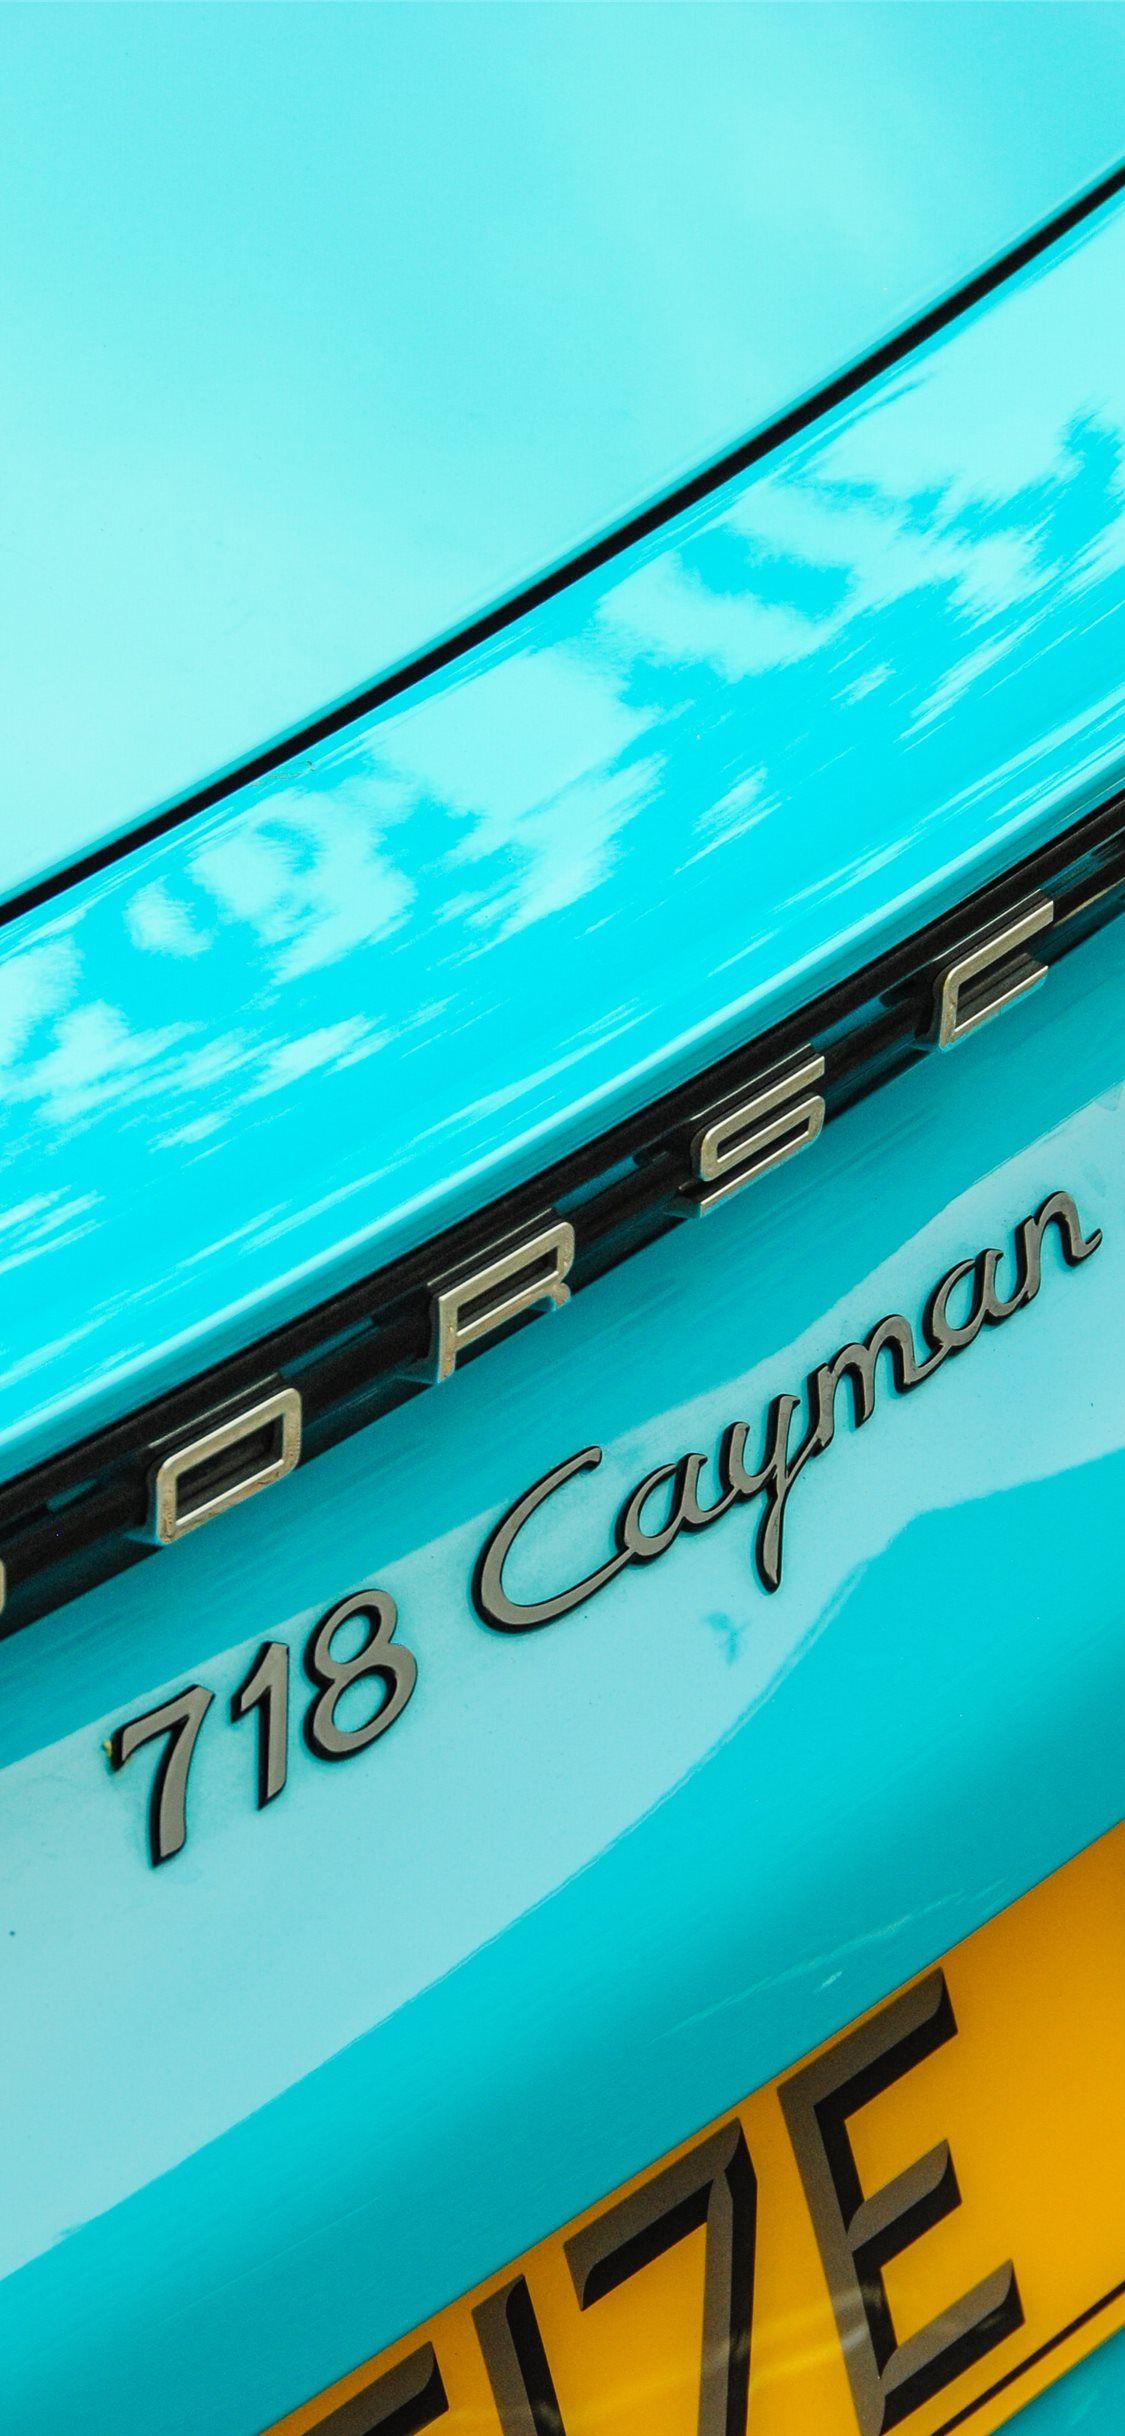 teal Porsche Cayman 718 S iPhone X Wallpapers in 2020